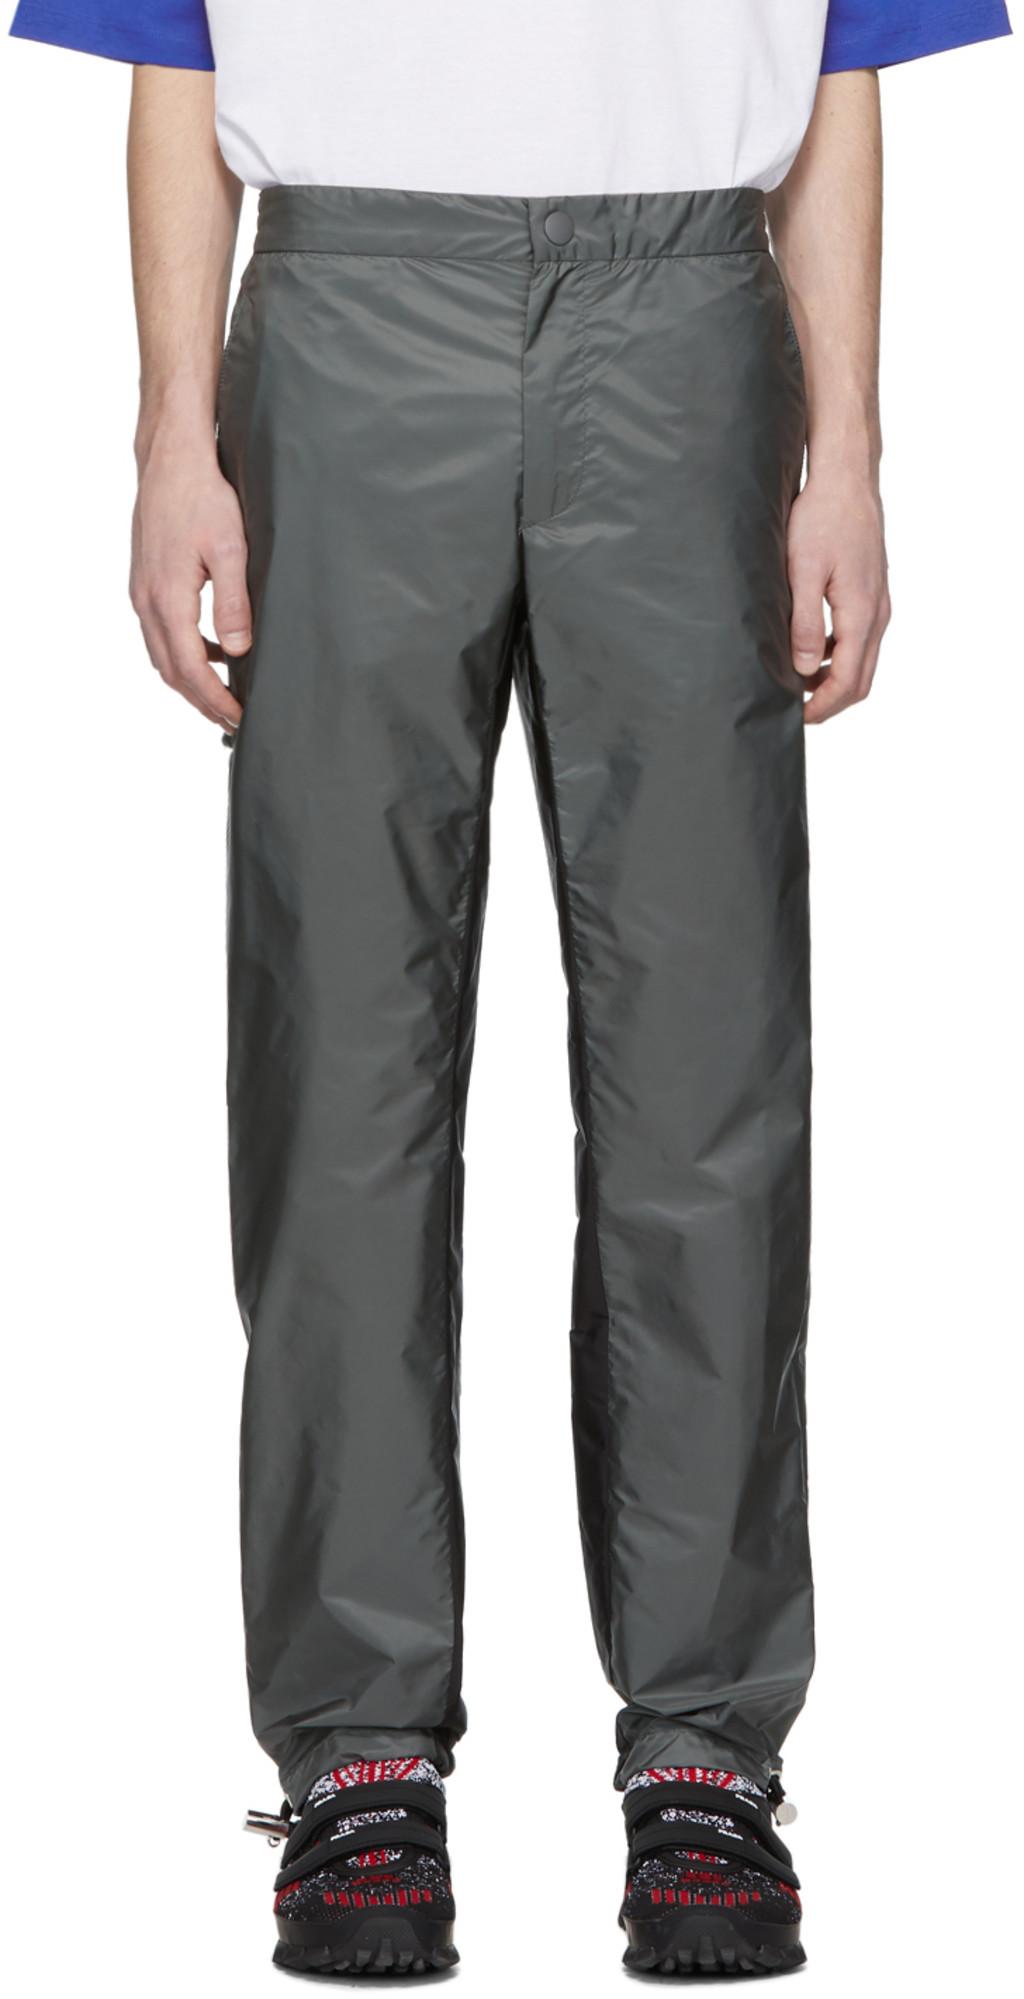 ce0e3fec Grey & Black Drawstring Trousers